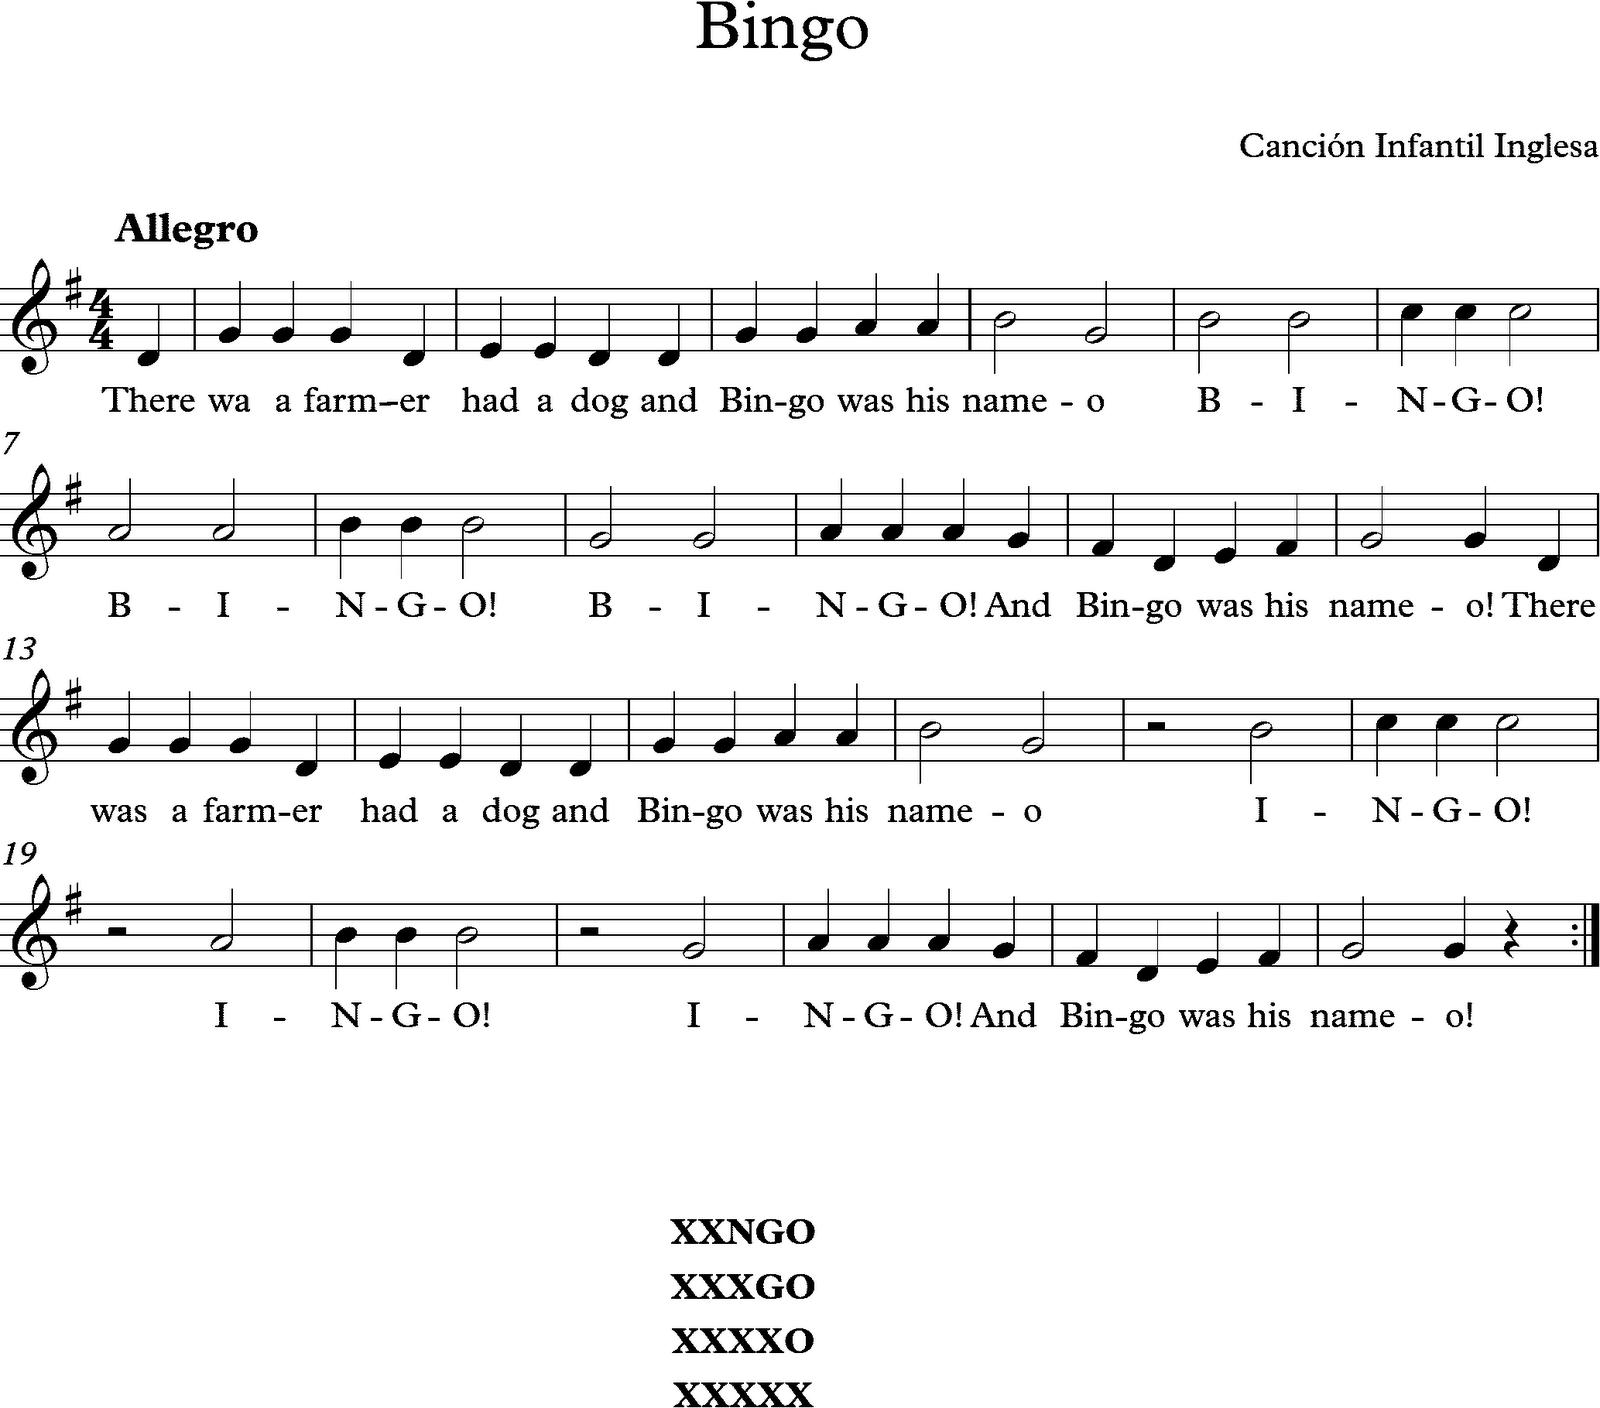 Descubriendo la m sica partituras para flauta dulce o de for Cancion el jardin prohibido